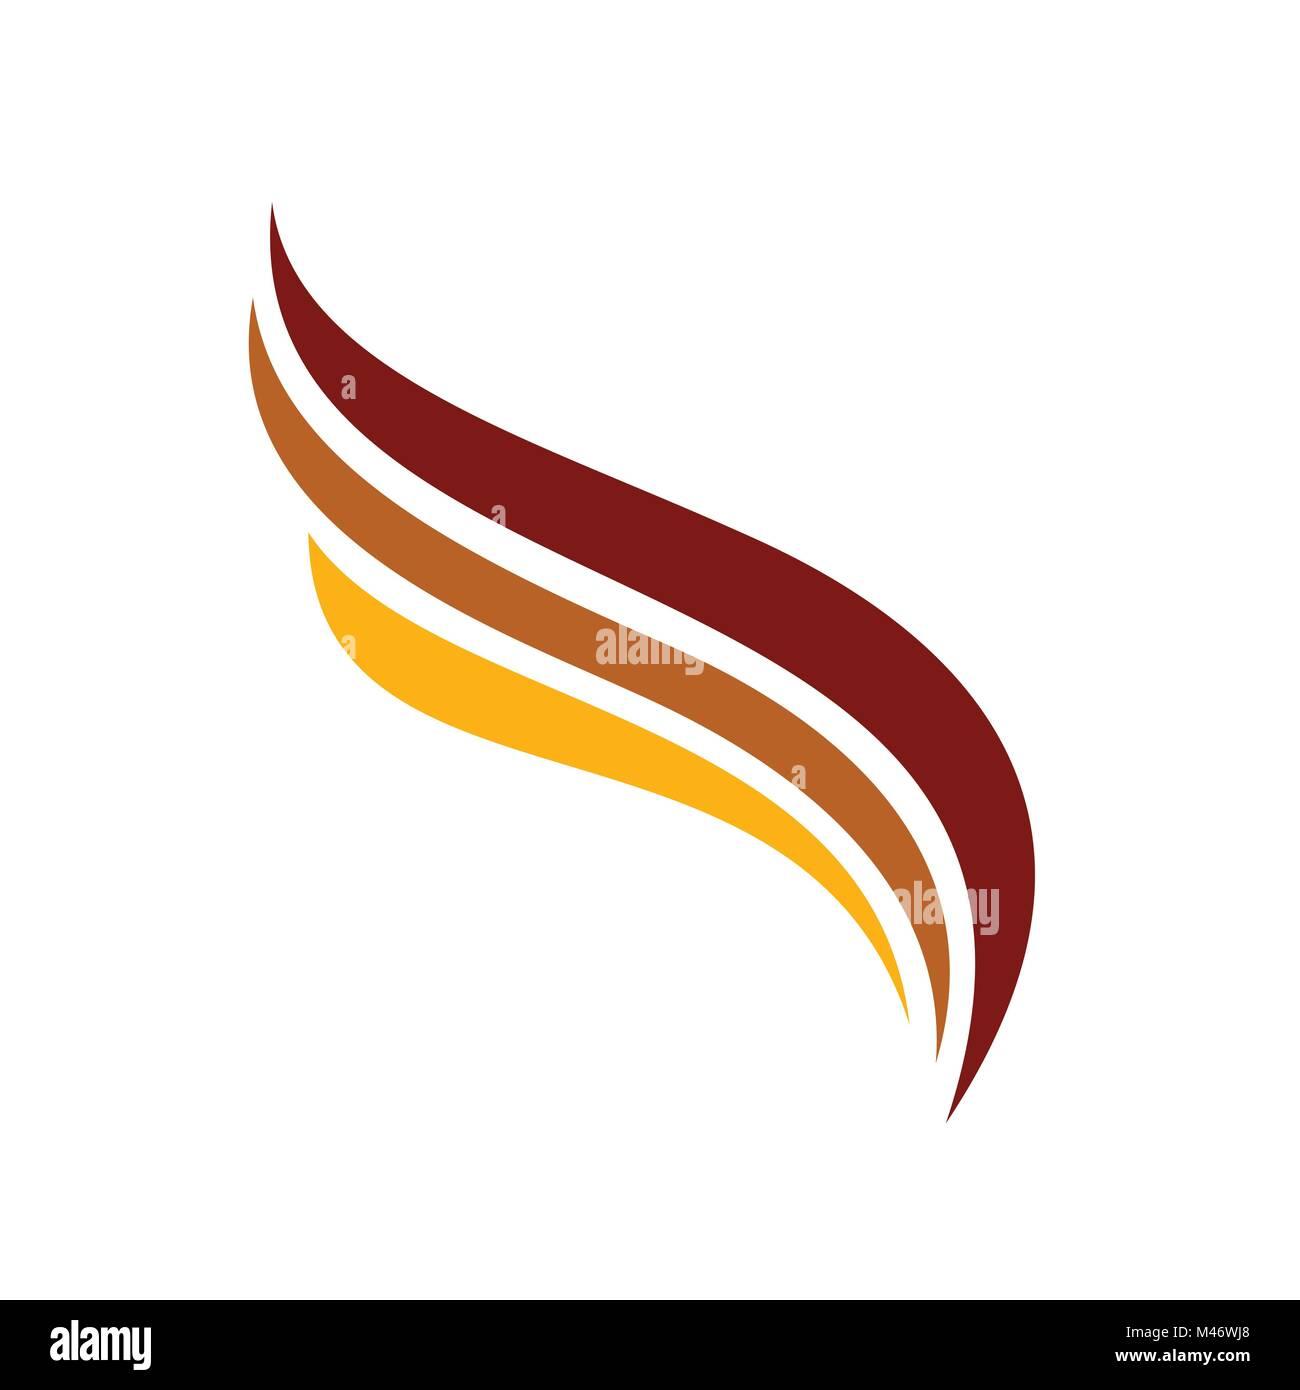 Triple Wings Symbol Line Art Symbol Logo Vector Graphic Design - Stock Image